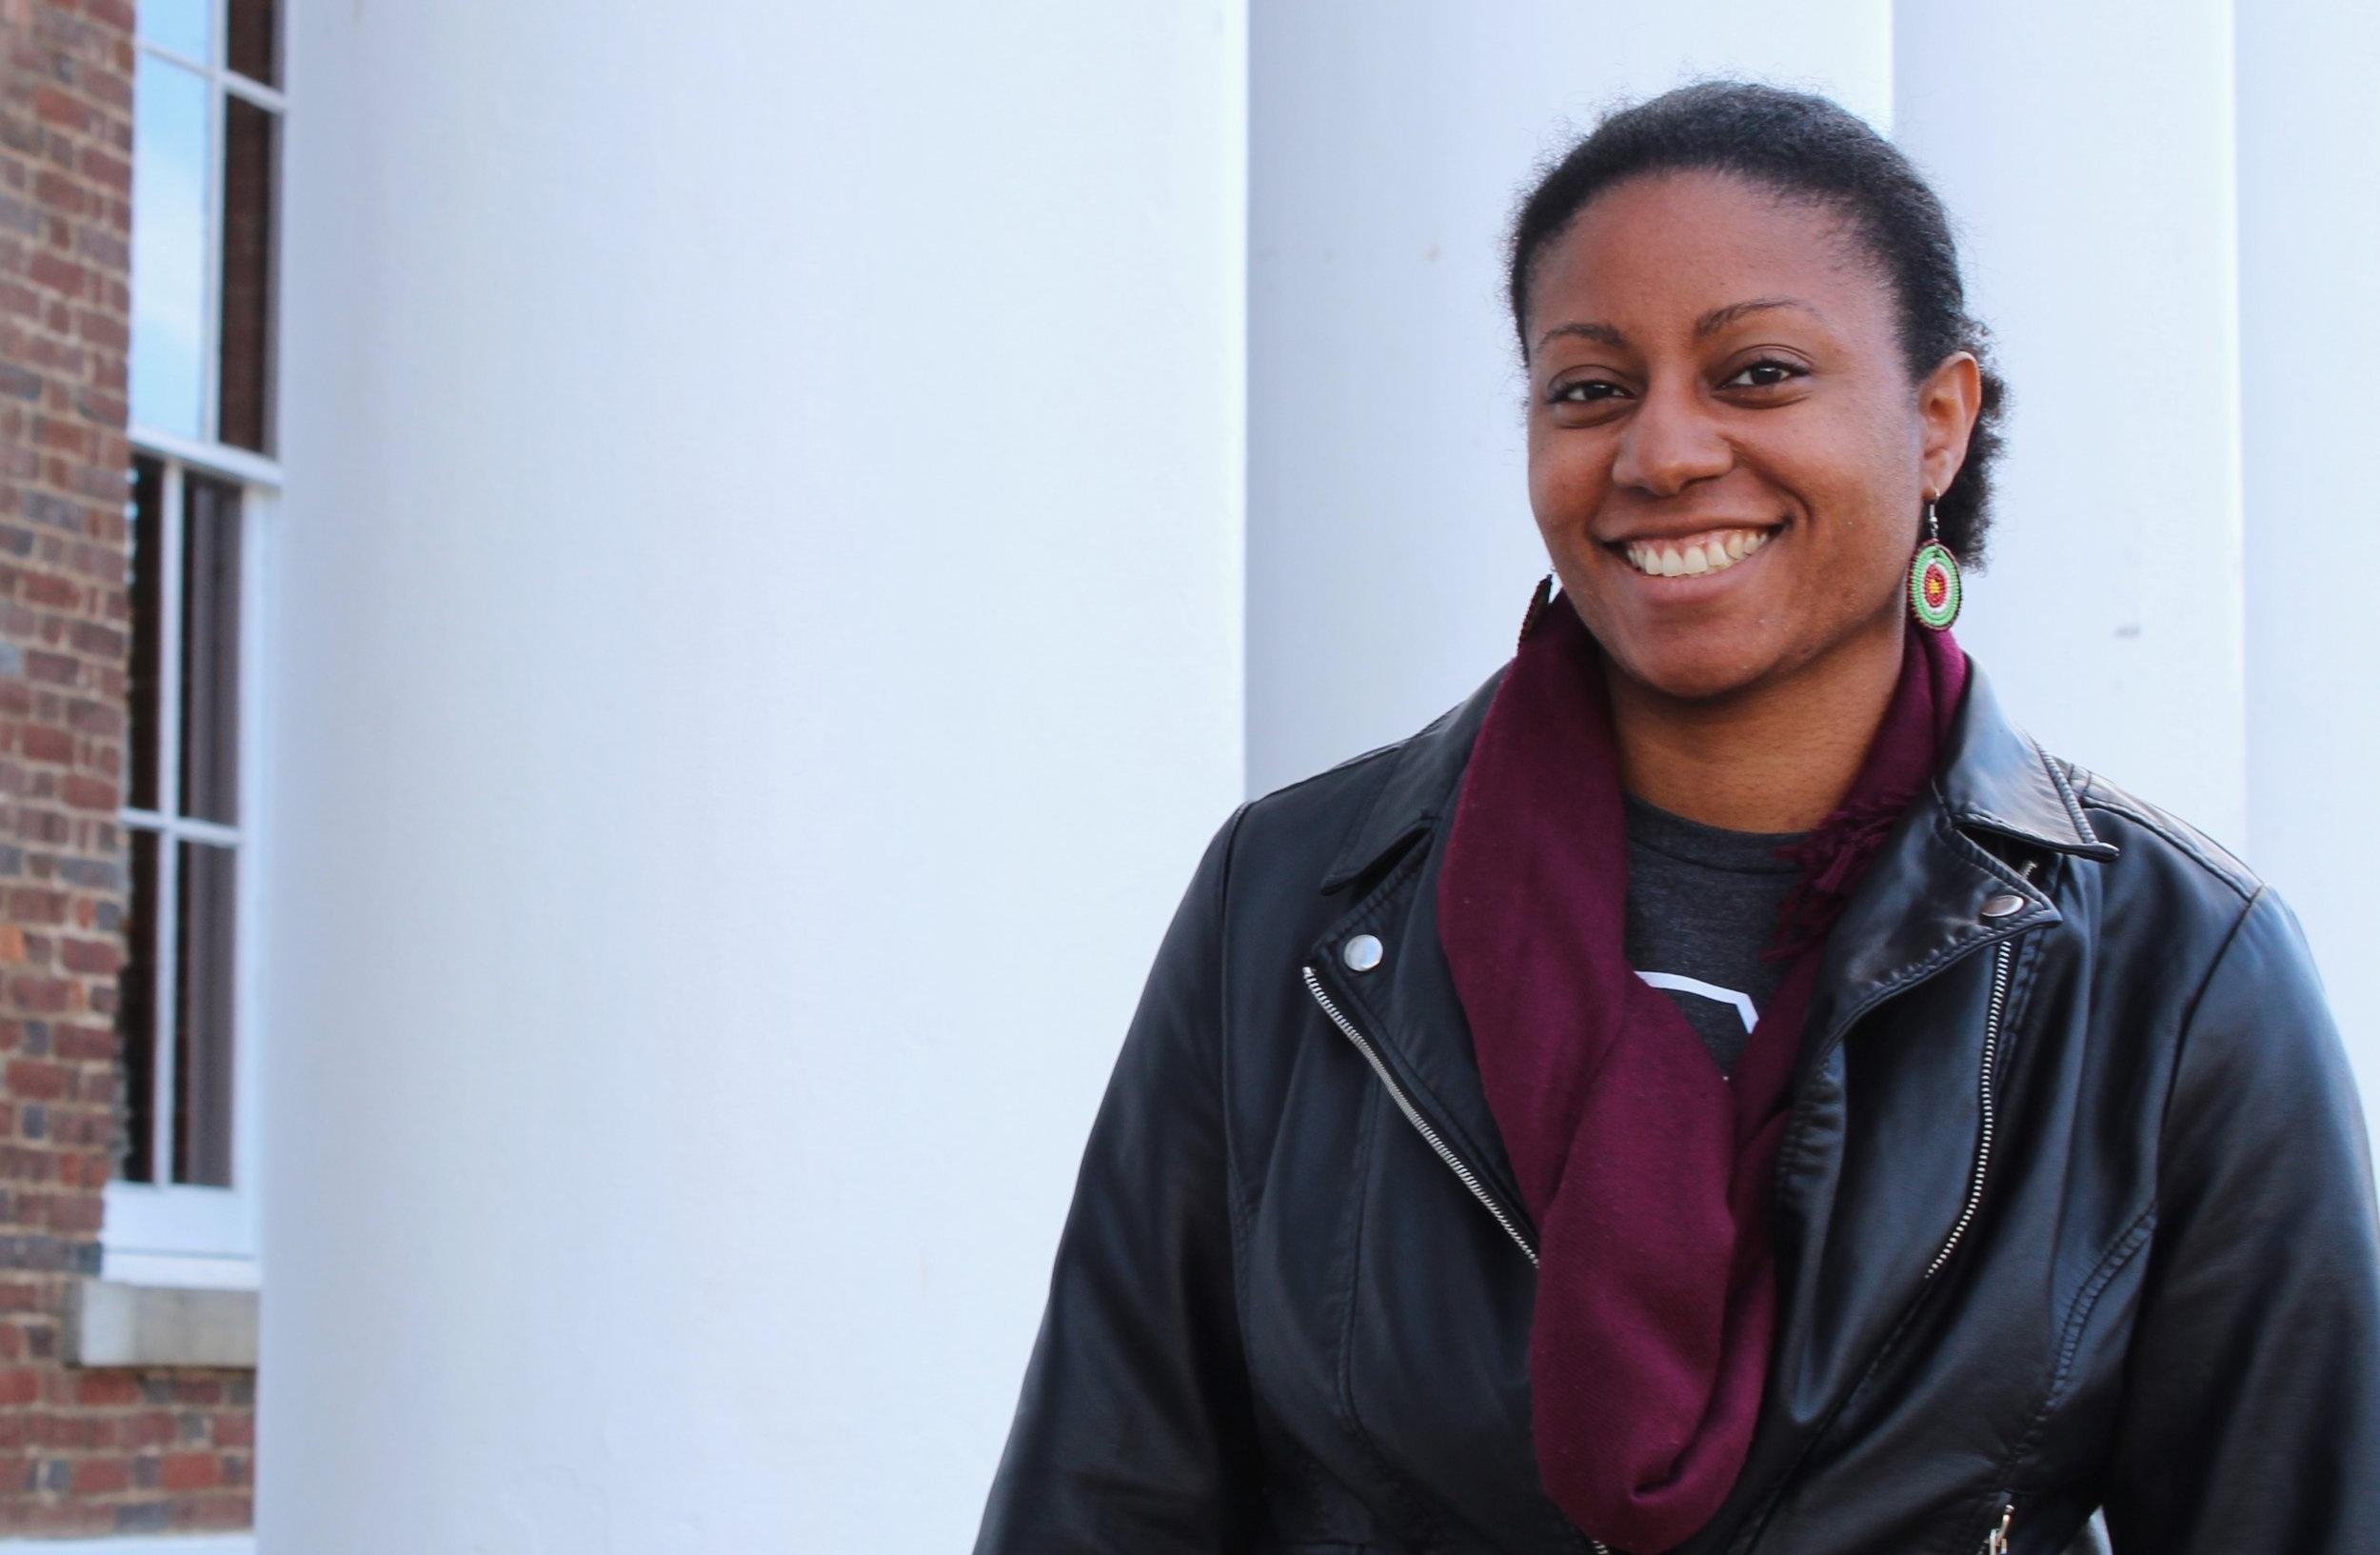 Nadine Michel, Horizons Fellow Mentor & M.D./Ph.D. candidate